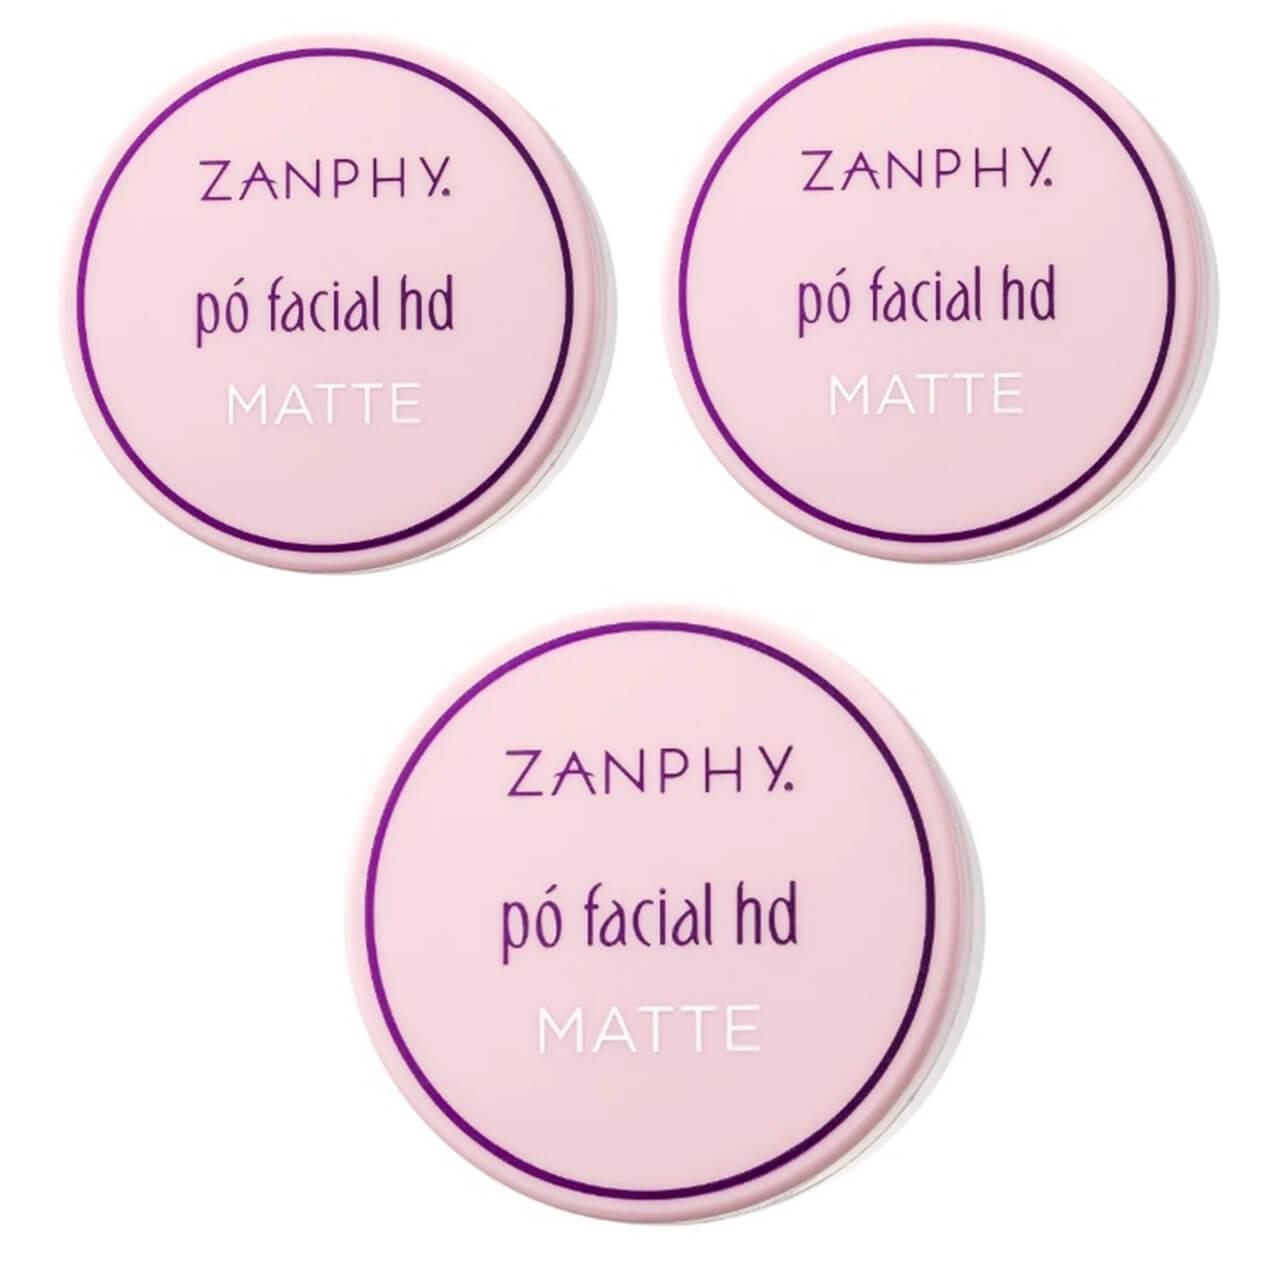 Pó Facial HD - Zanphy